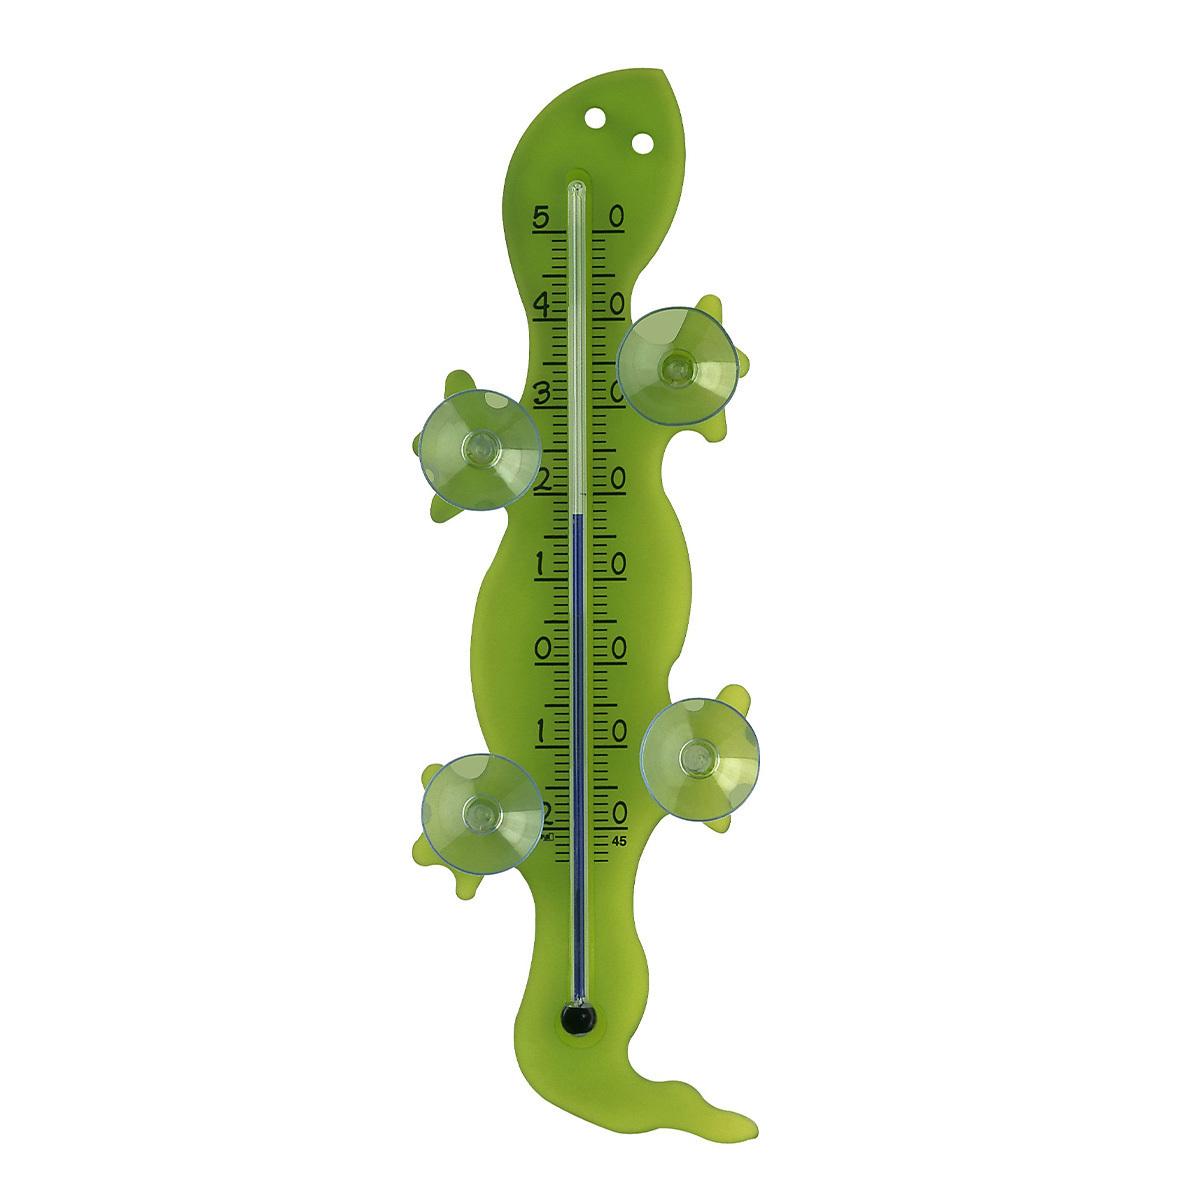 14-6018-analoges-fensterthermometer-gecko-1200x1200px.jpg